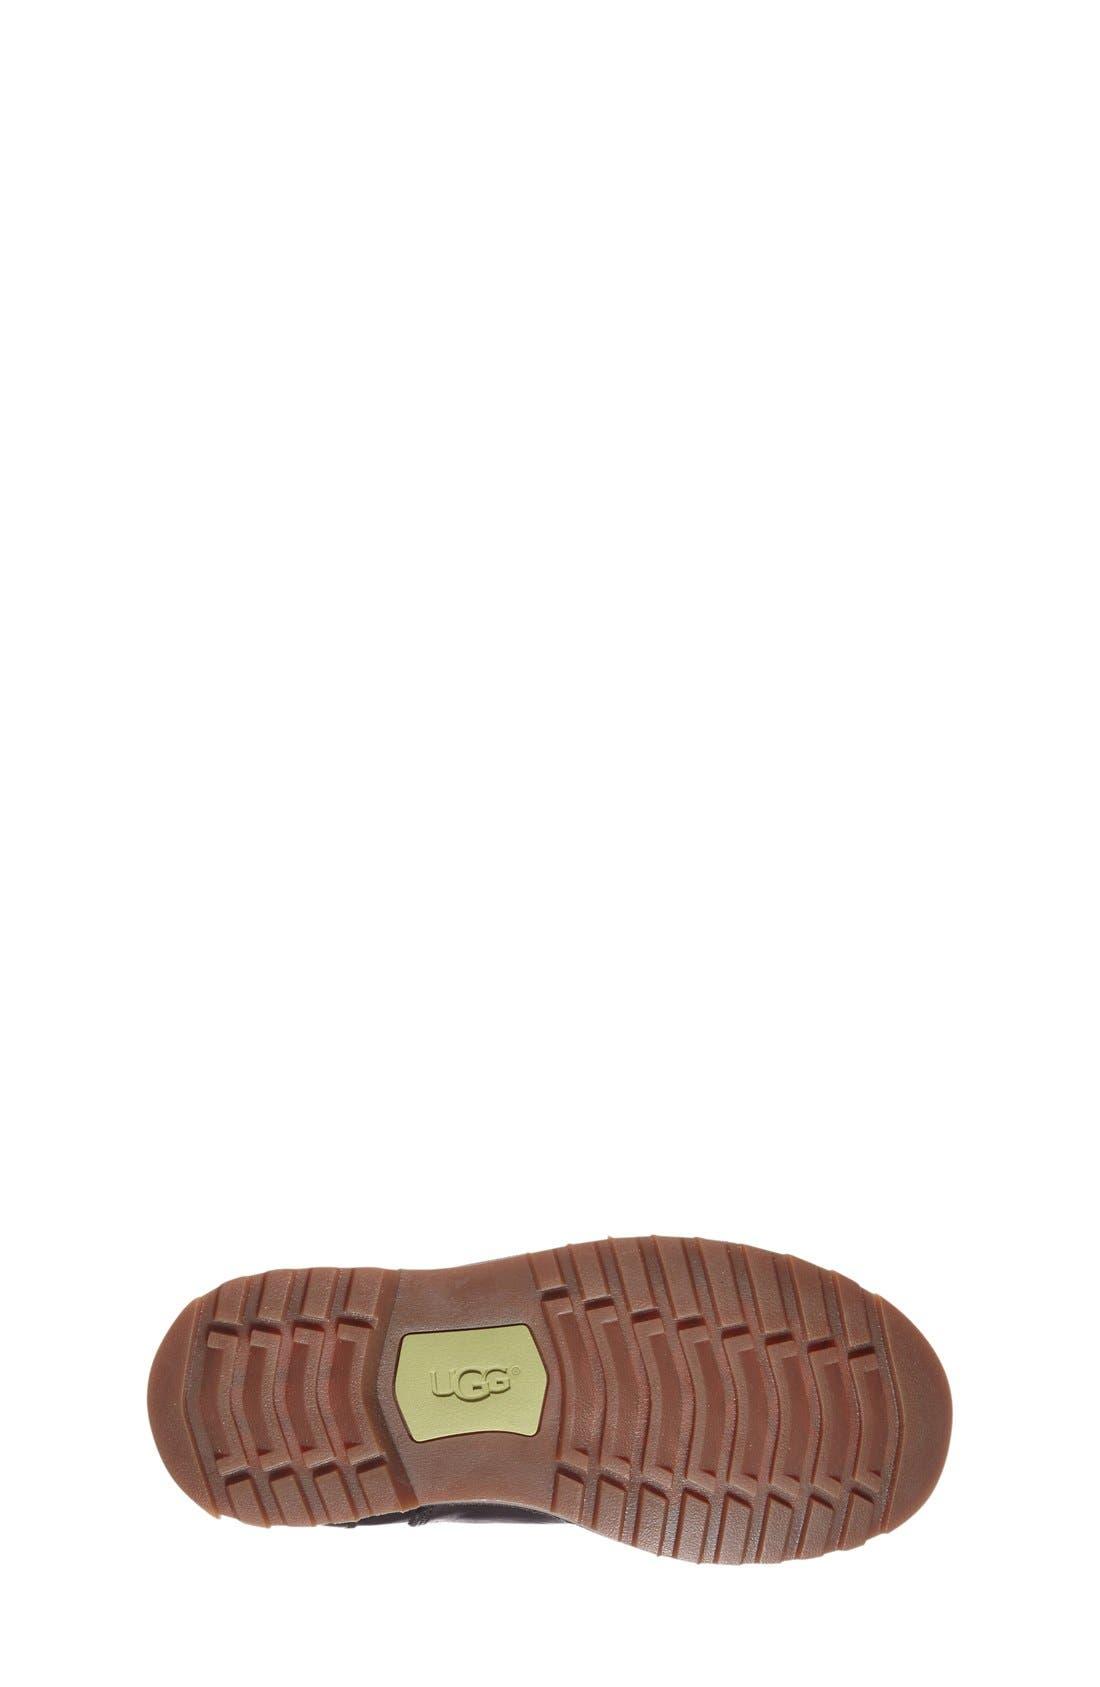 Alternate Image 4  - UGG® Callum Water Resistant Chelsea Boot (Walker, Toddler, Little Kid & Big Kid)